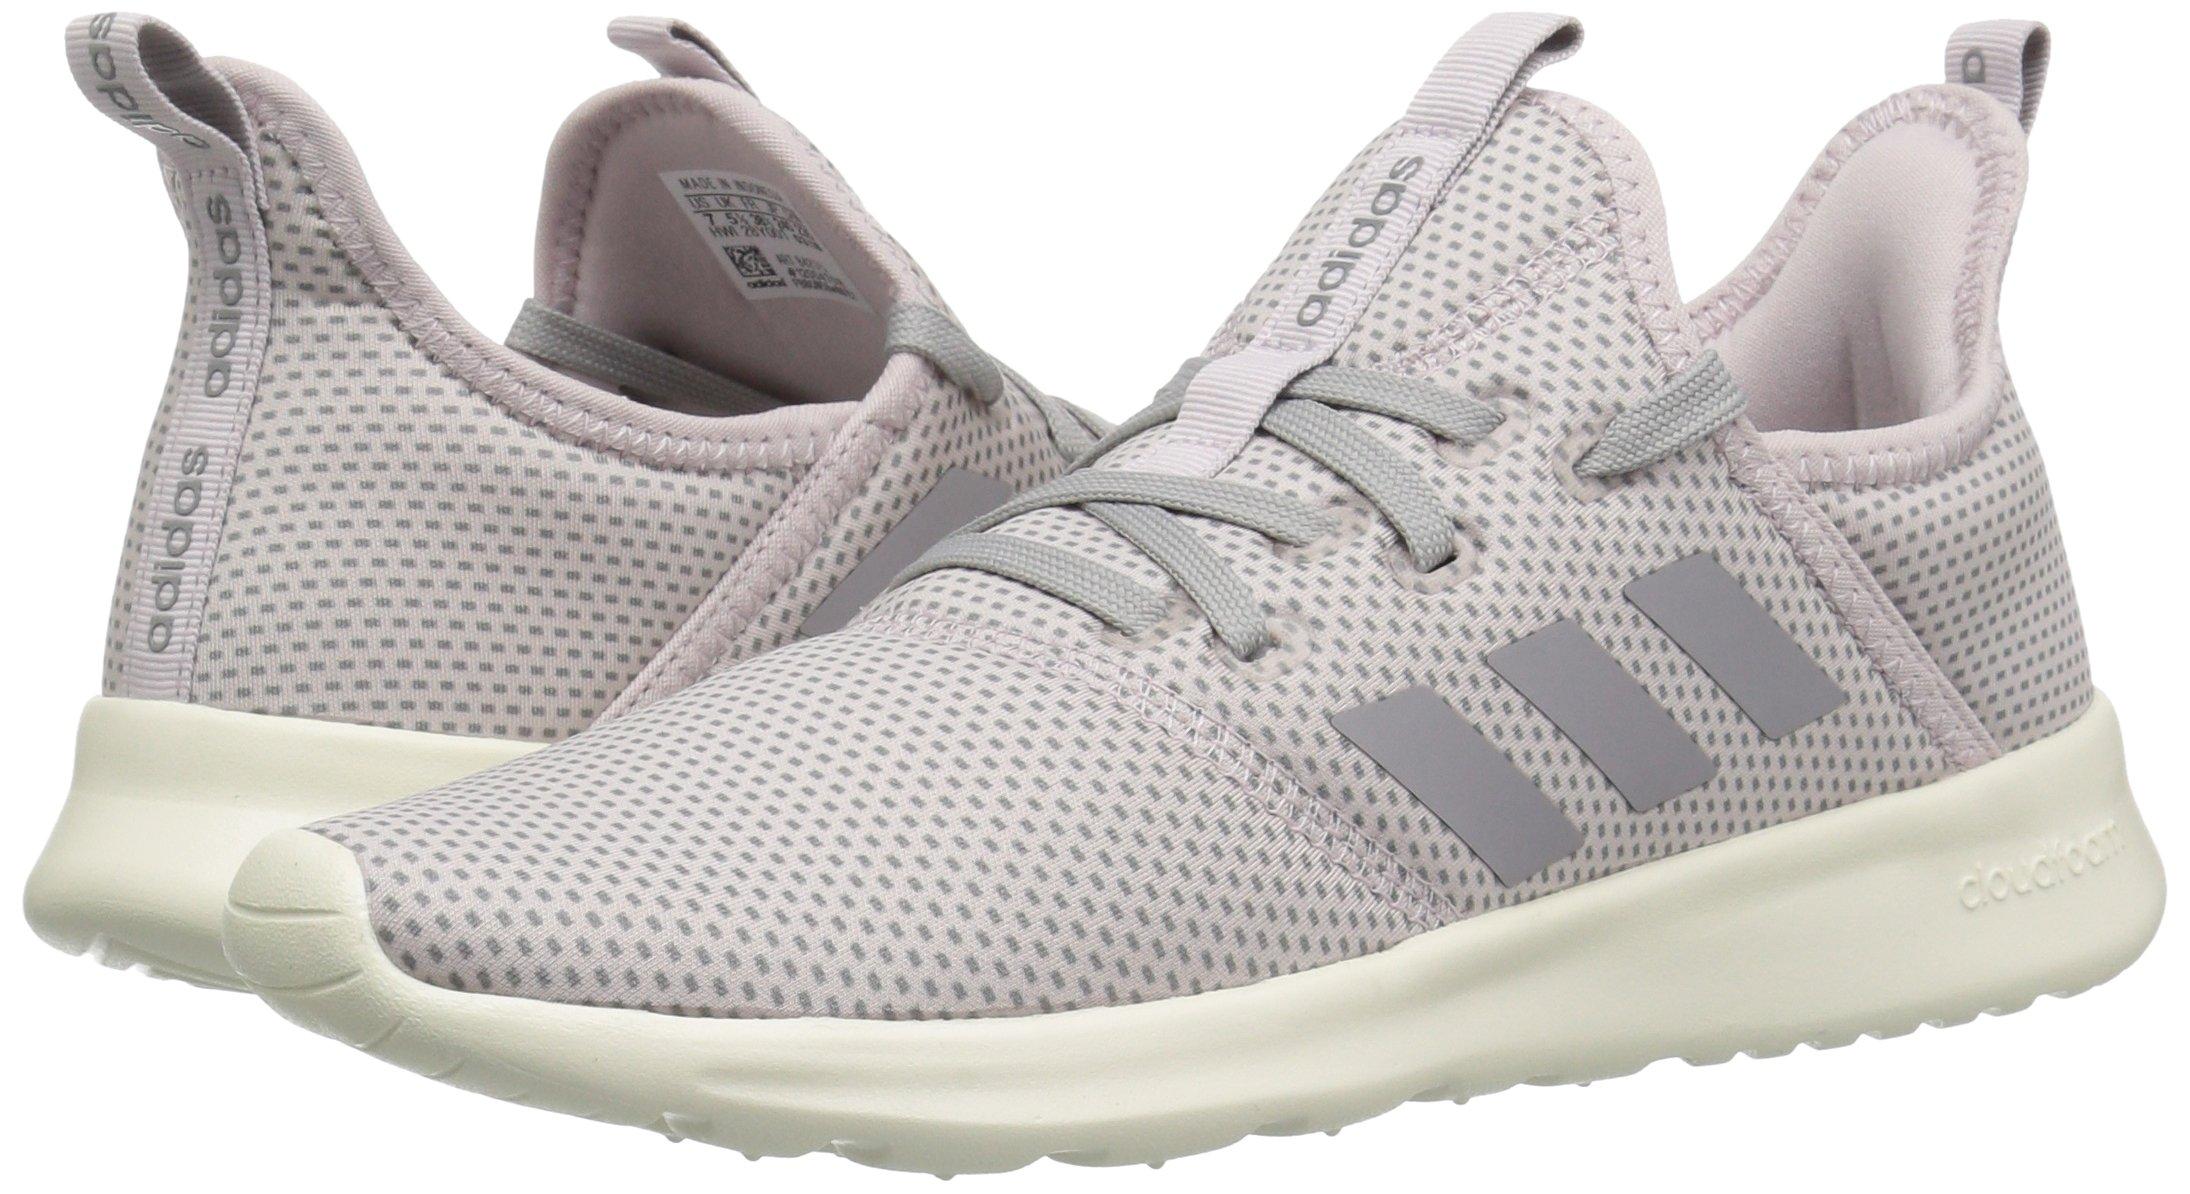 adidas Performance Women's Cloudfoam Pure Running Shoe, Ice Purple/Grey/White, 5 M US by adidas (Image #5)